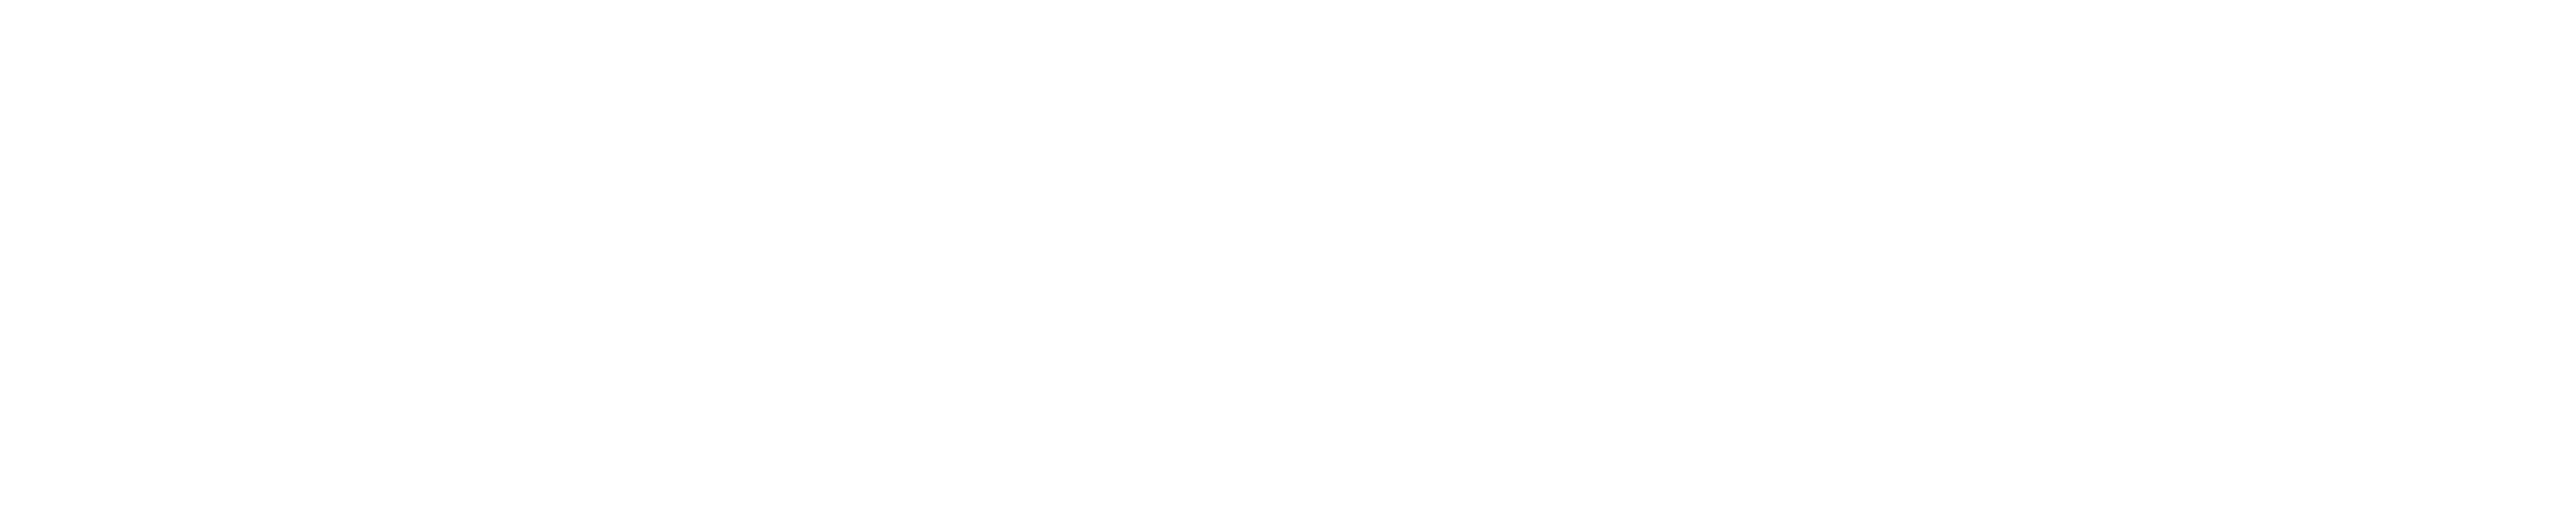 thrive-festival-2020-logo